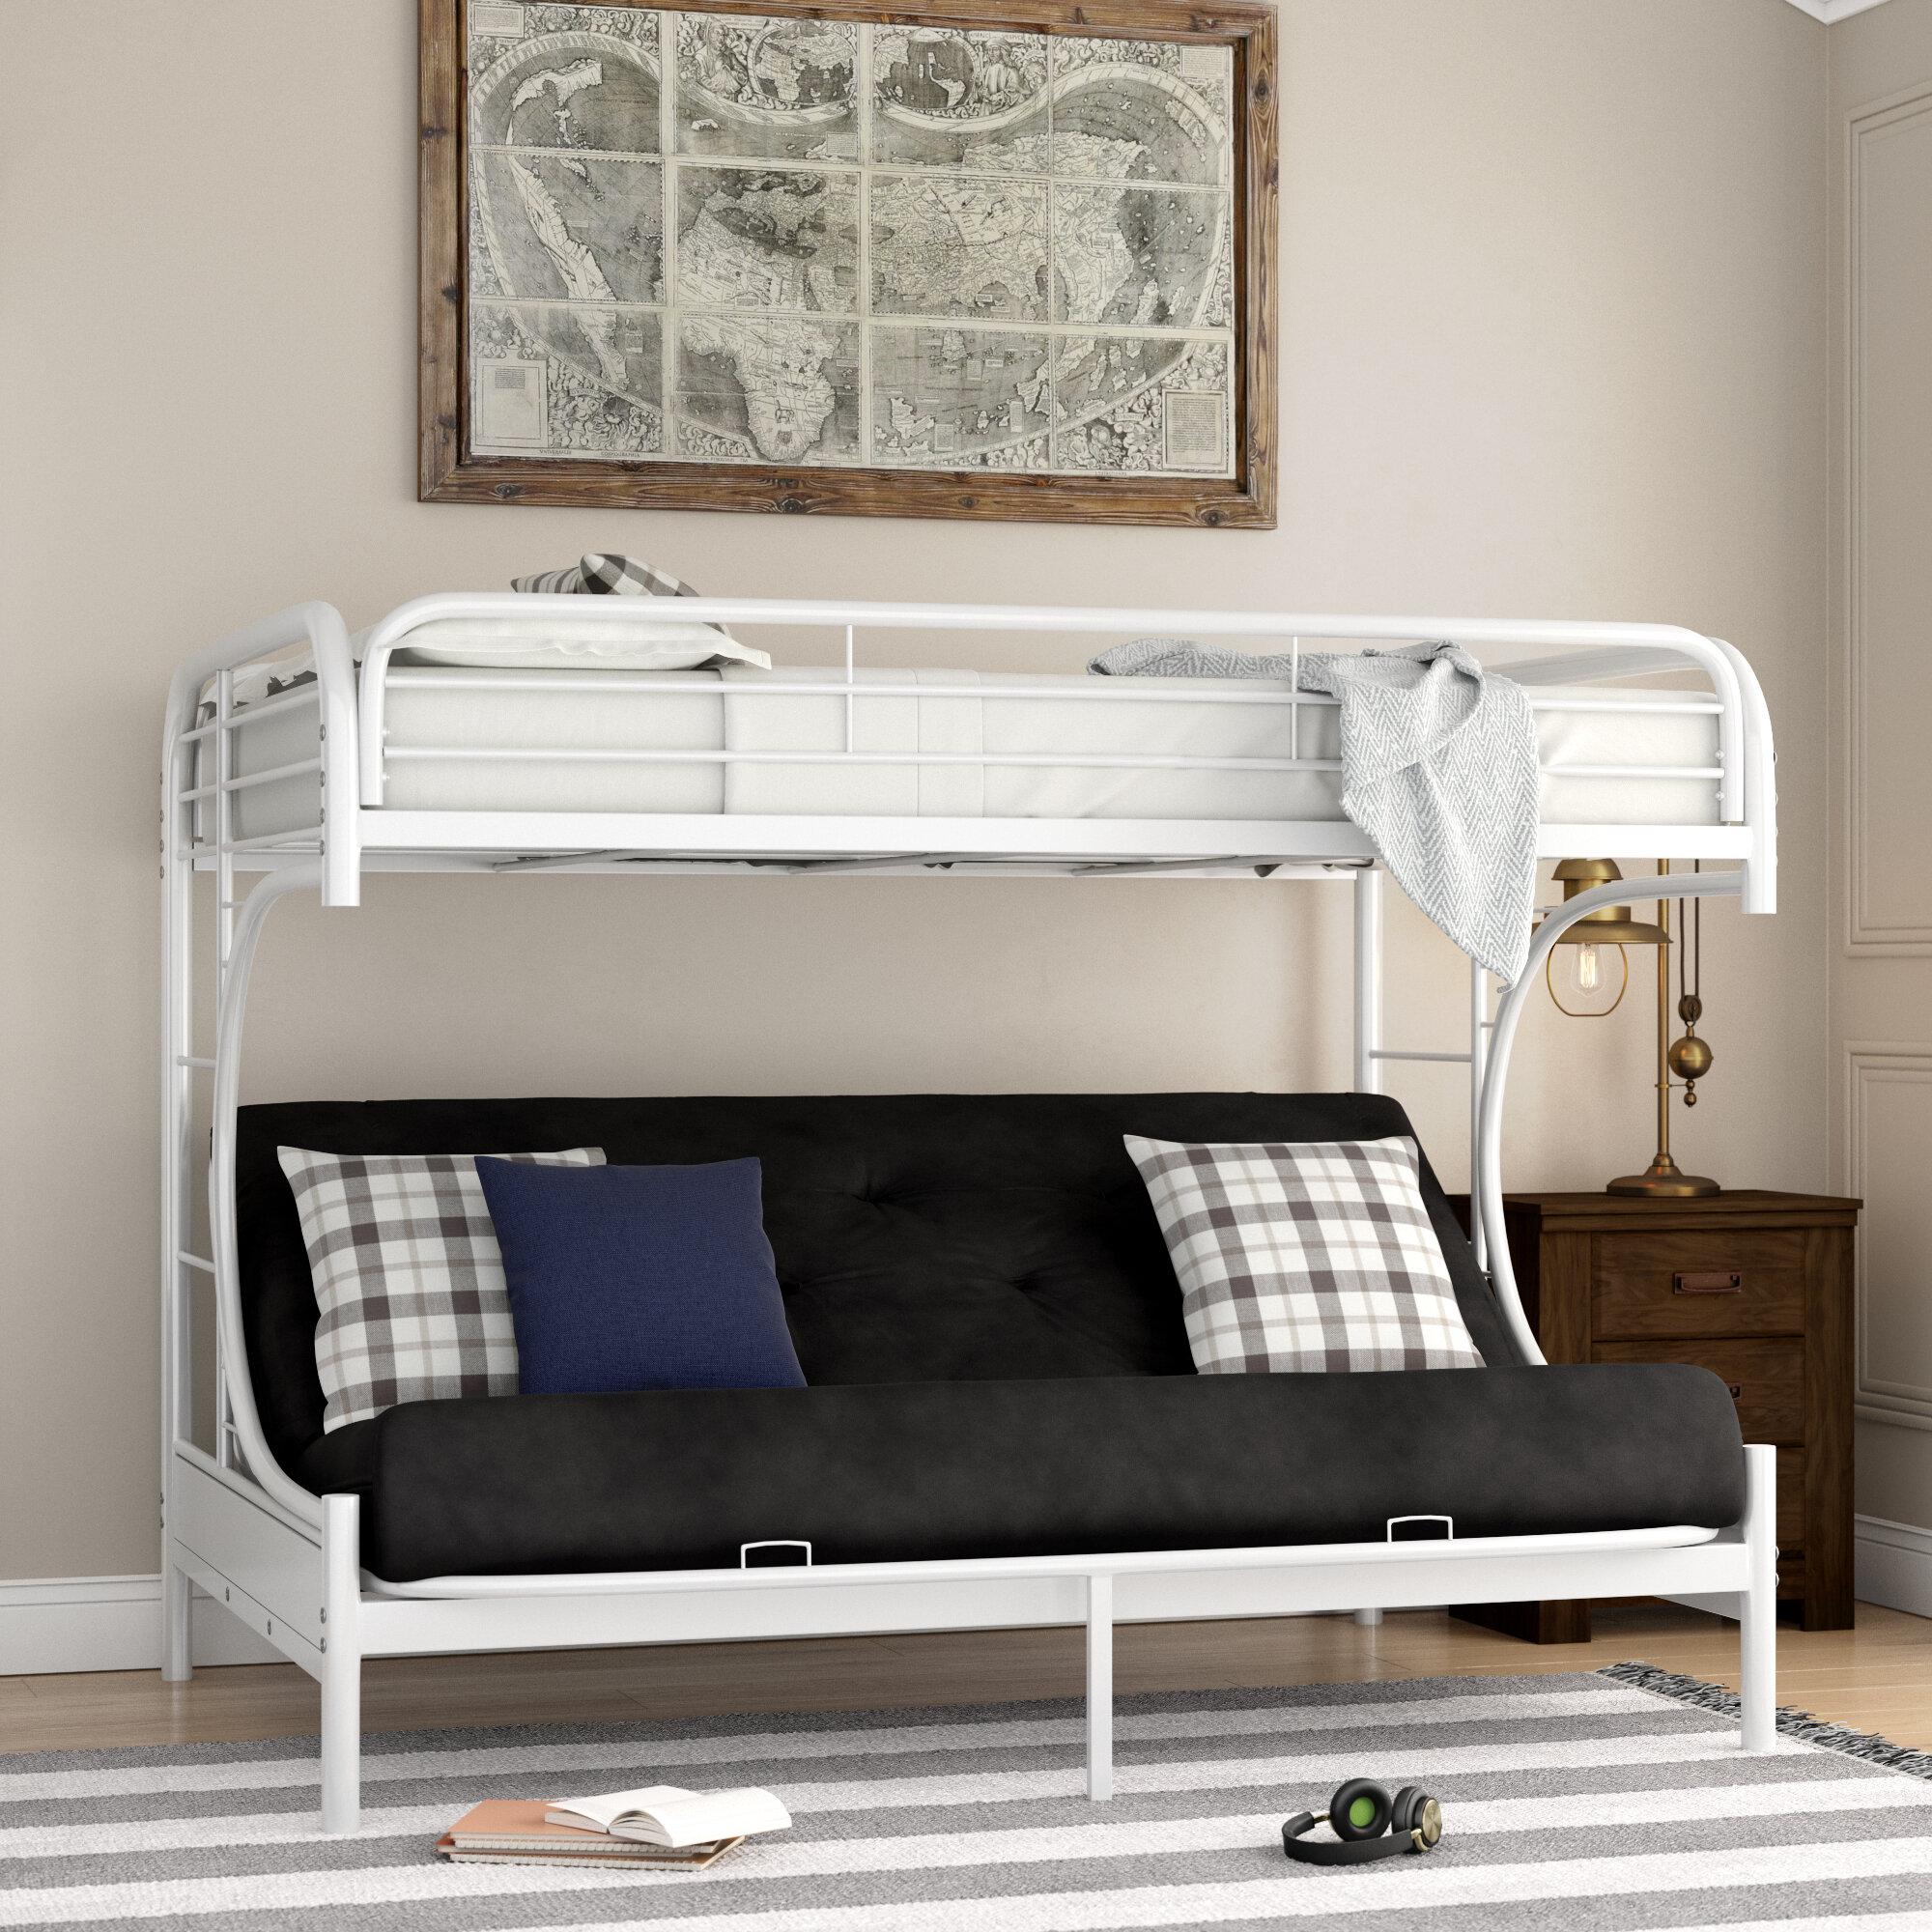 Twin Xl Over Queen Futon Bunk Bed